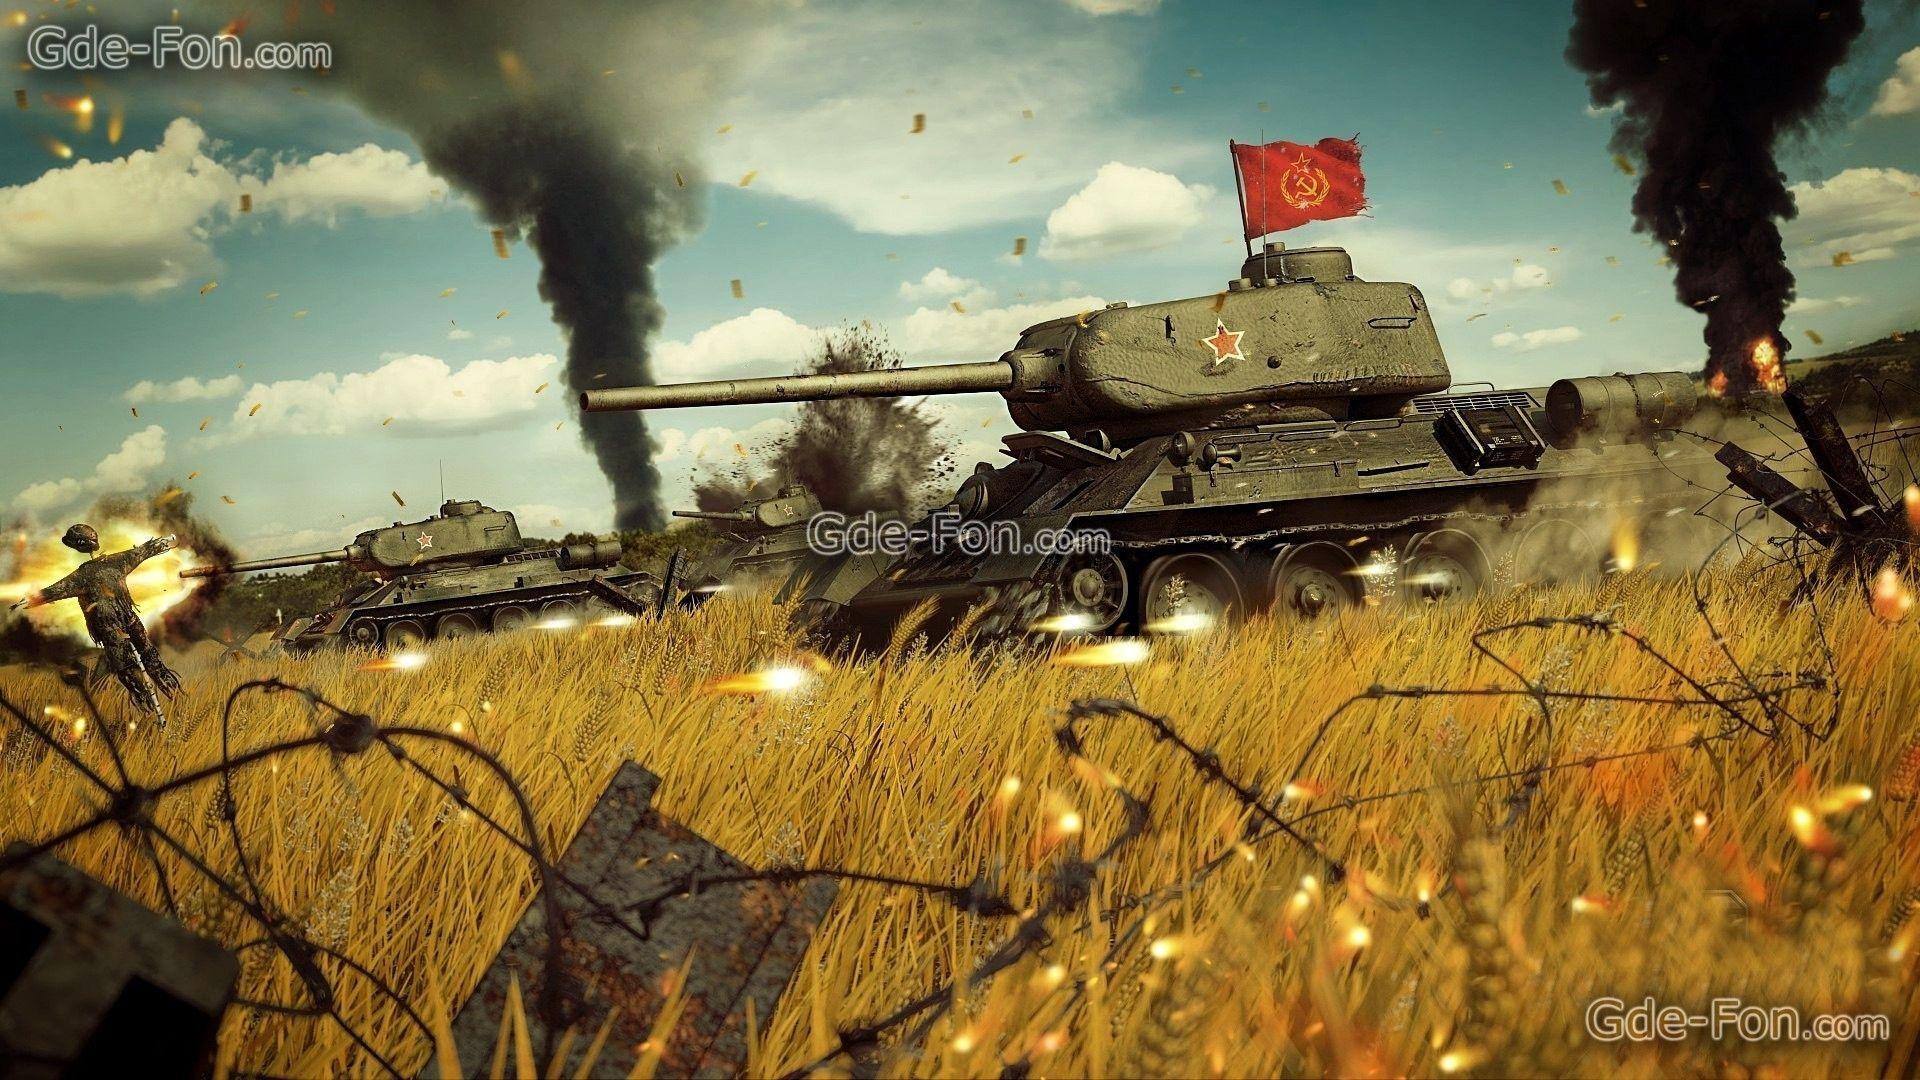 Download wallpaper Red Army, Soviet medium tank during